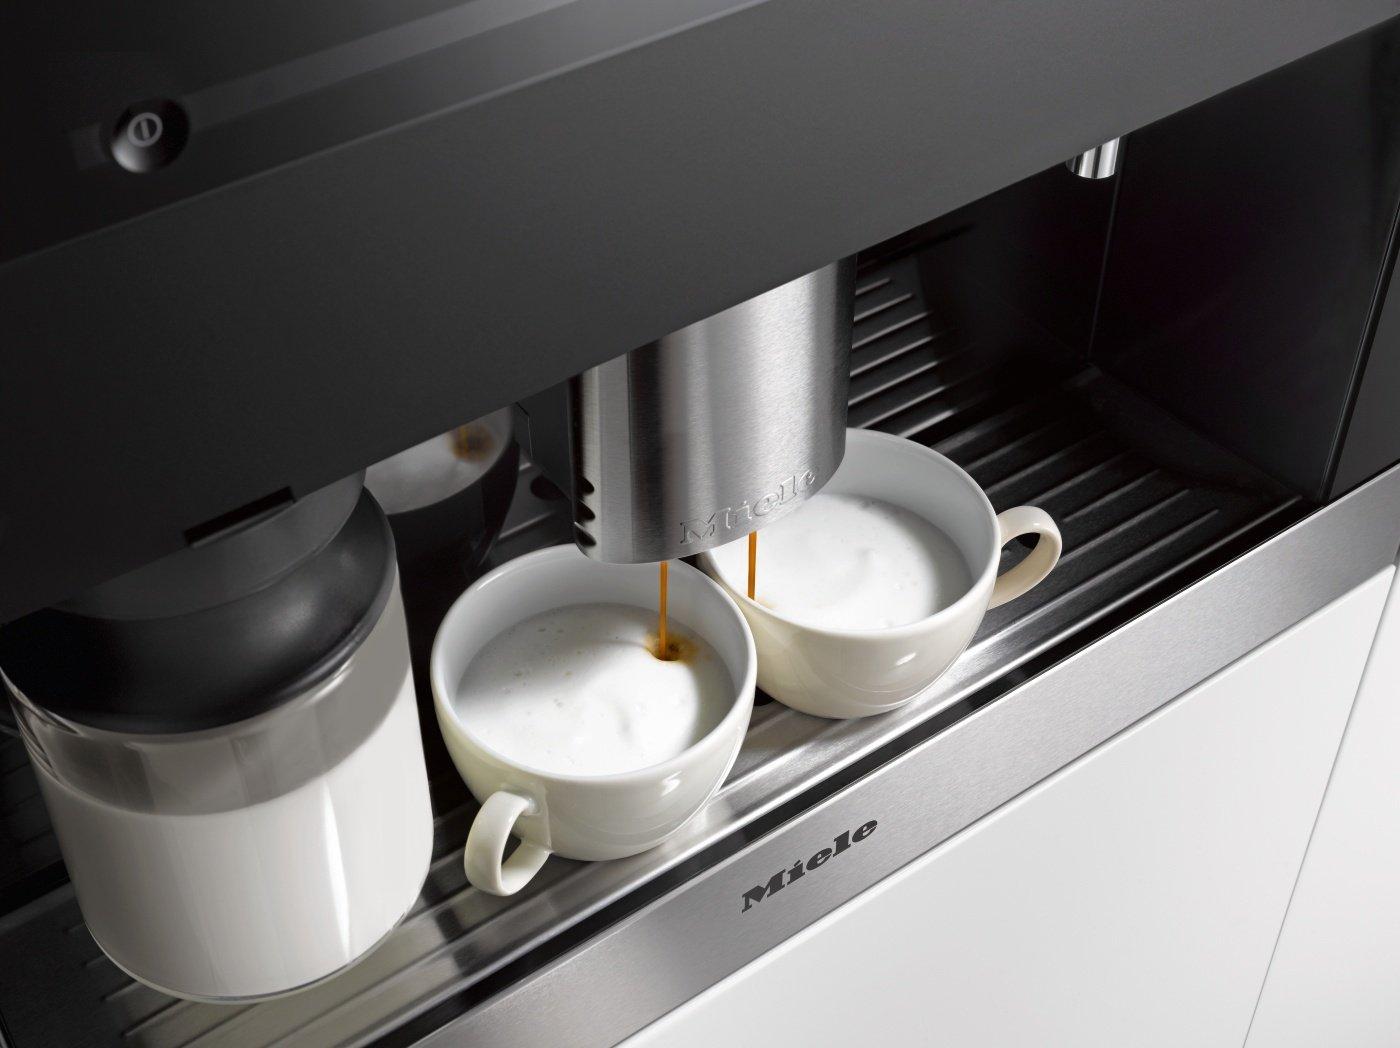 Miele-9521960-CVA6401-Brillantmit-BohnenmahlwerkEinbau-Kaffeevollautomat